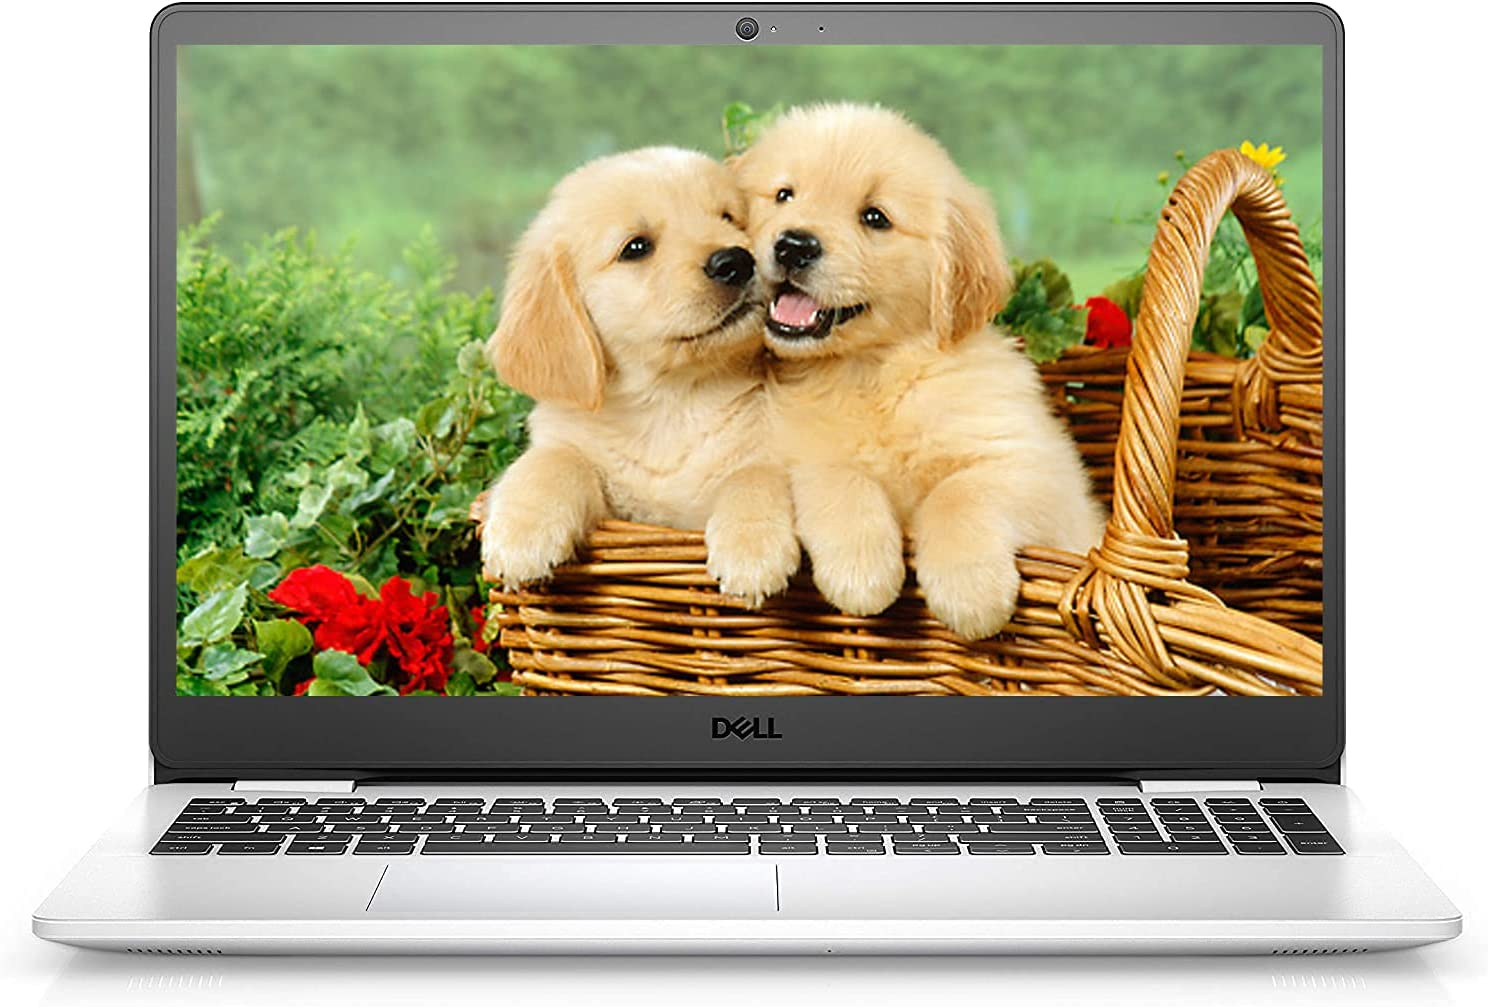 Newest Dell Inspiron 3000 Business Laptop, 15.6 FHD LED-Backlit Display, AMD Ryzen 3 3250U Processor, 12GB DDR4 RAM, 256GB PCIe SSD,Online Meeting Ready, Webcam, HDMI, FP Reader, Windows10 Pro, White